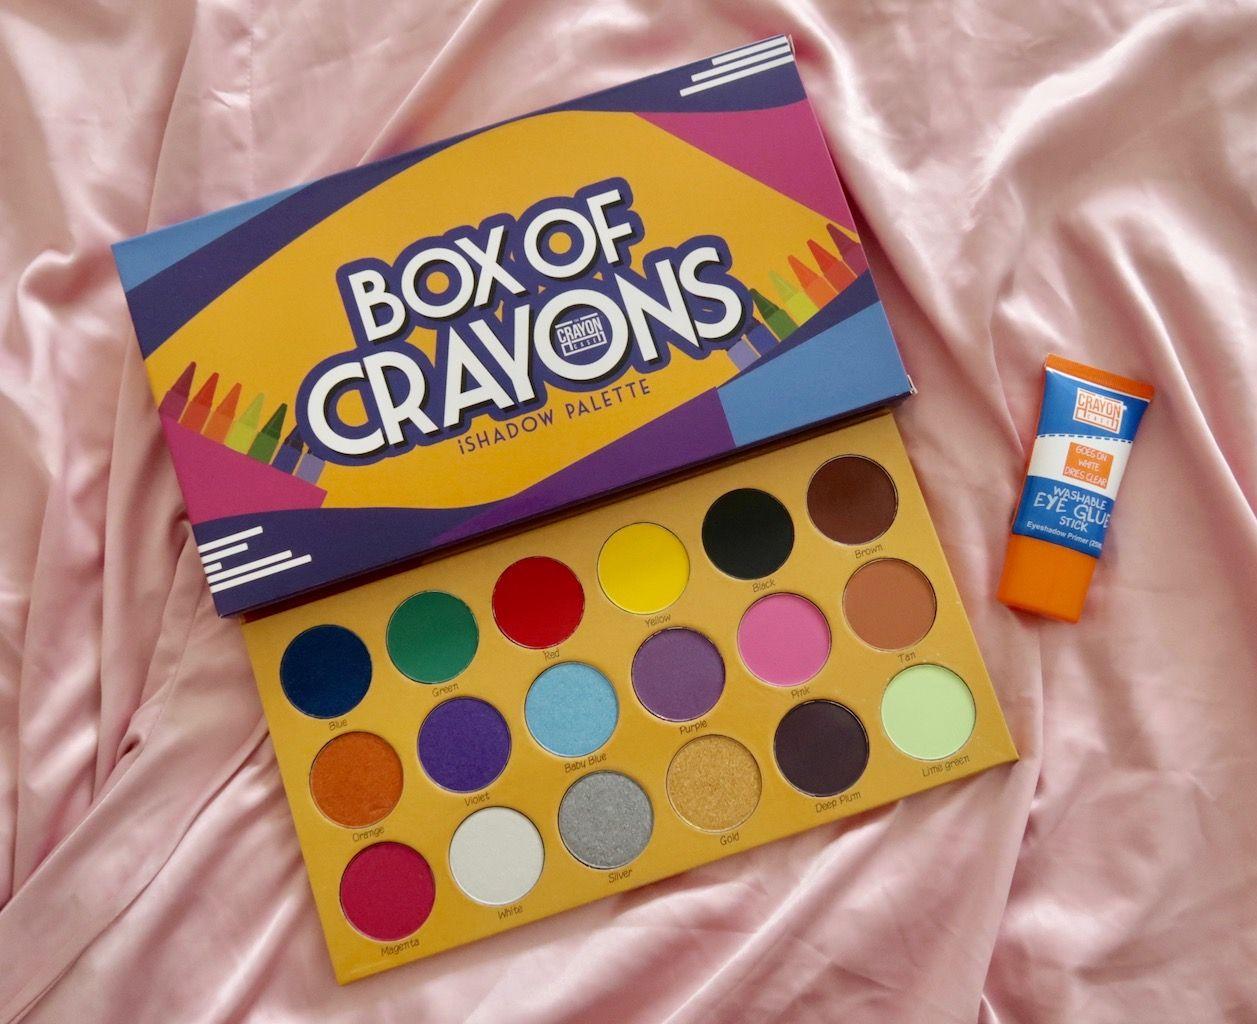 box of crayons makeup palette box of crayons eyeshadow